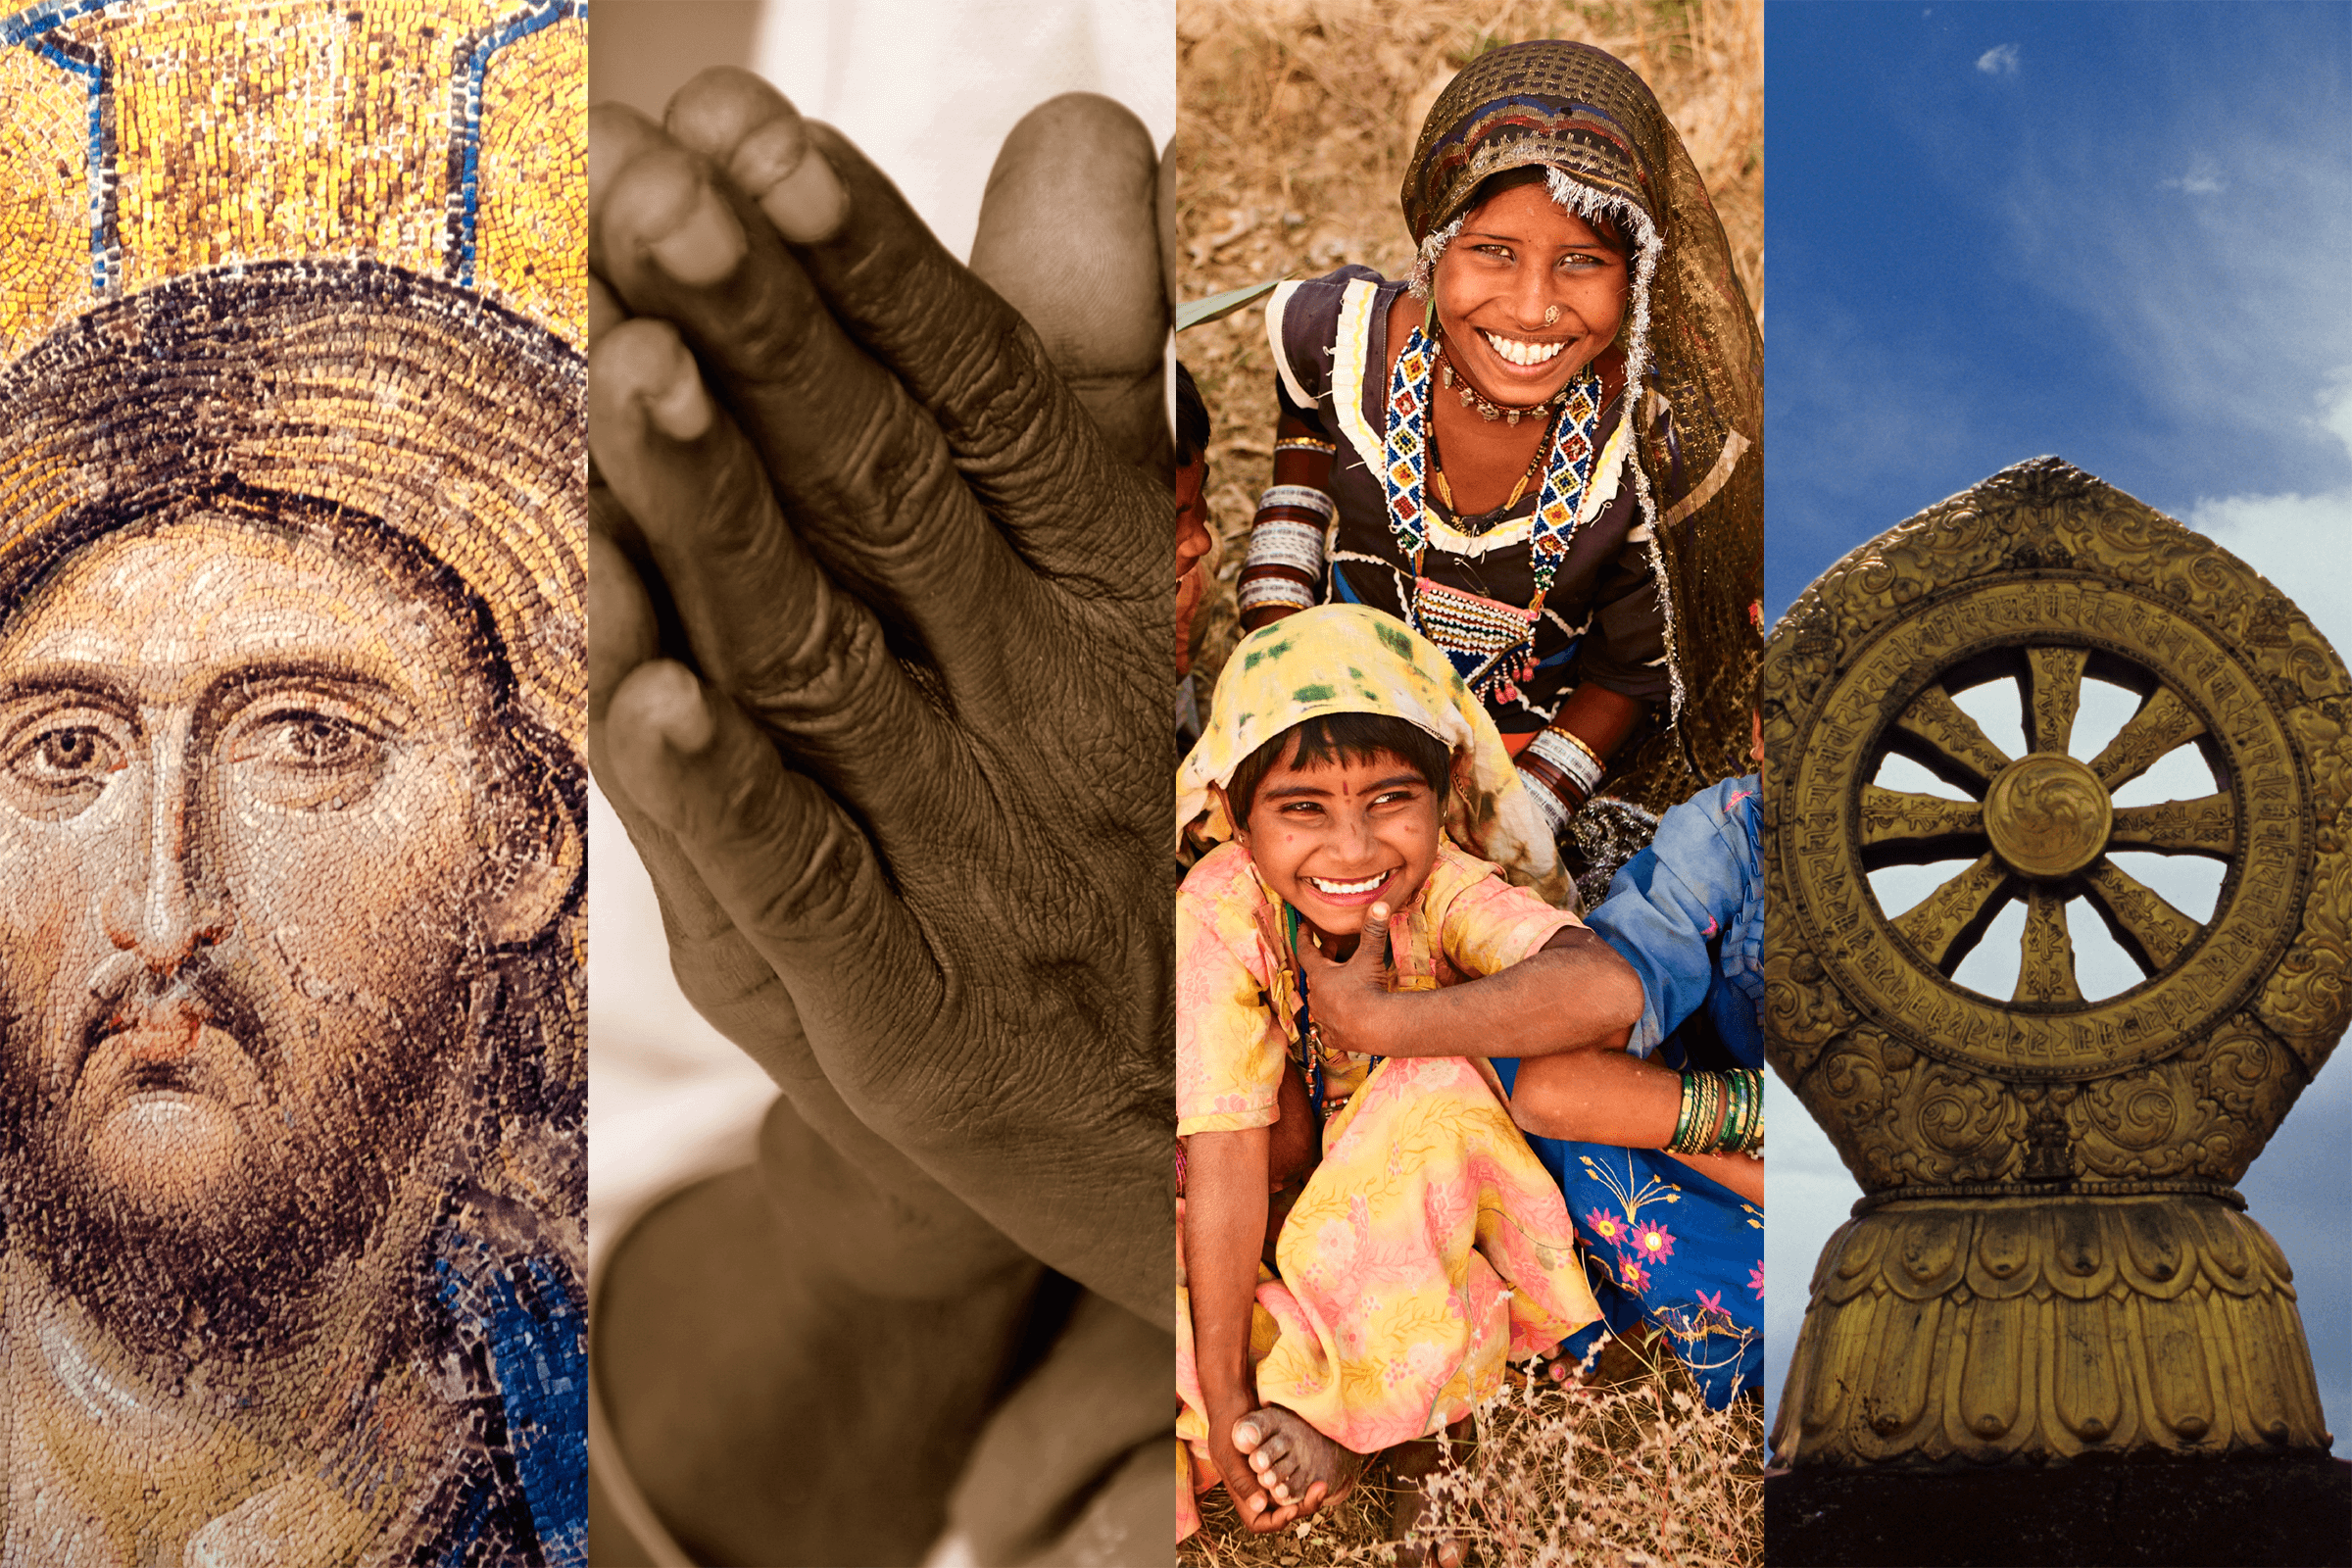 Collage of Religious Symbols